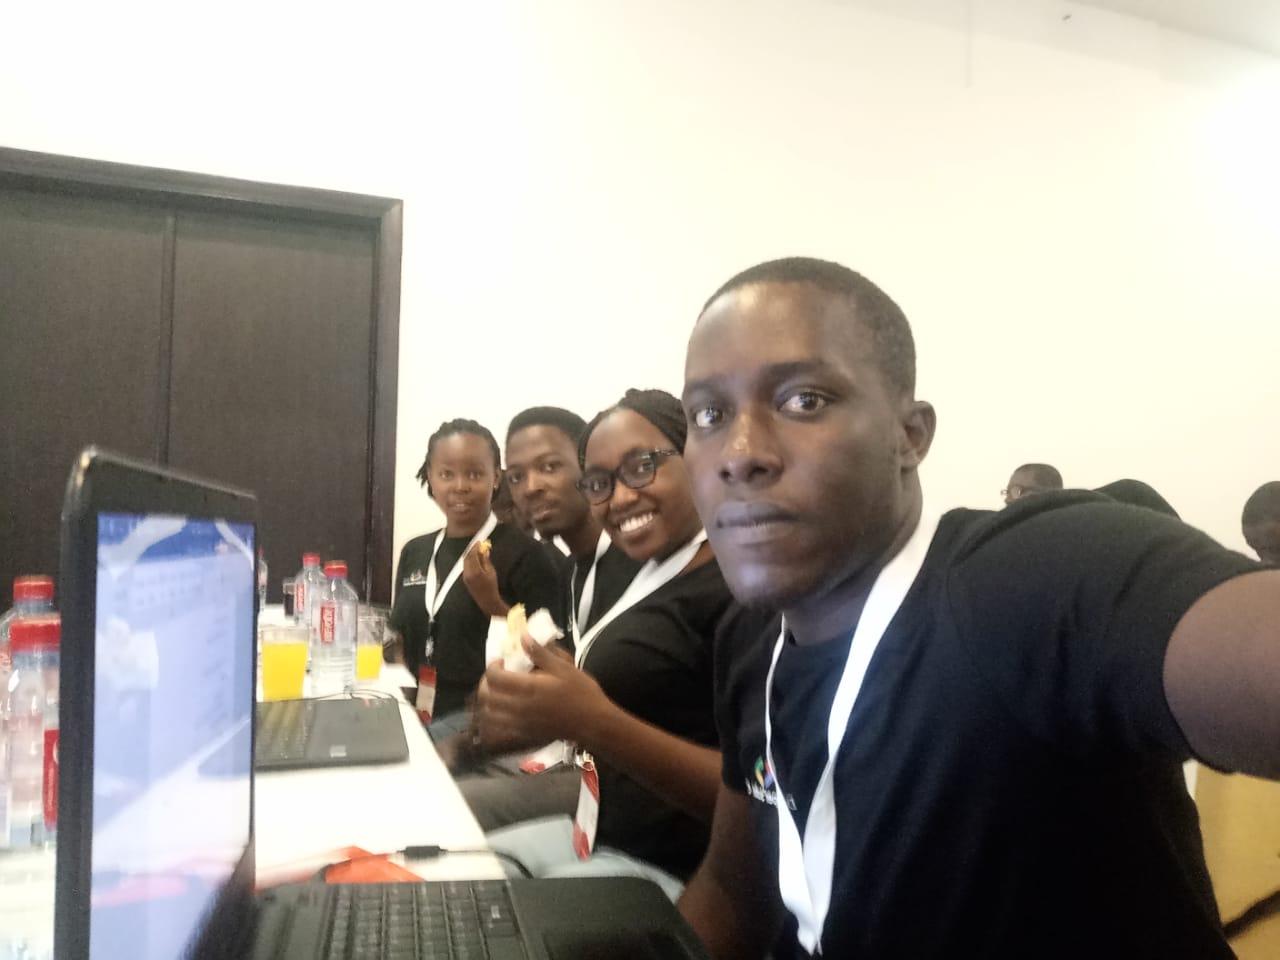 Samuel-Ouma-at-Google-Developer-Student-Clubs-Lead-Summit_1